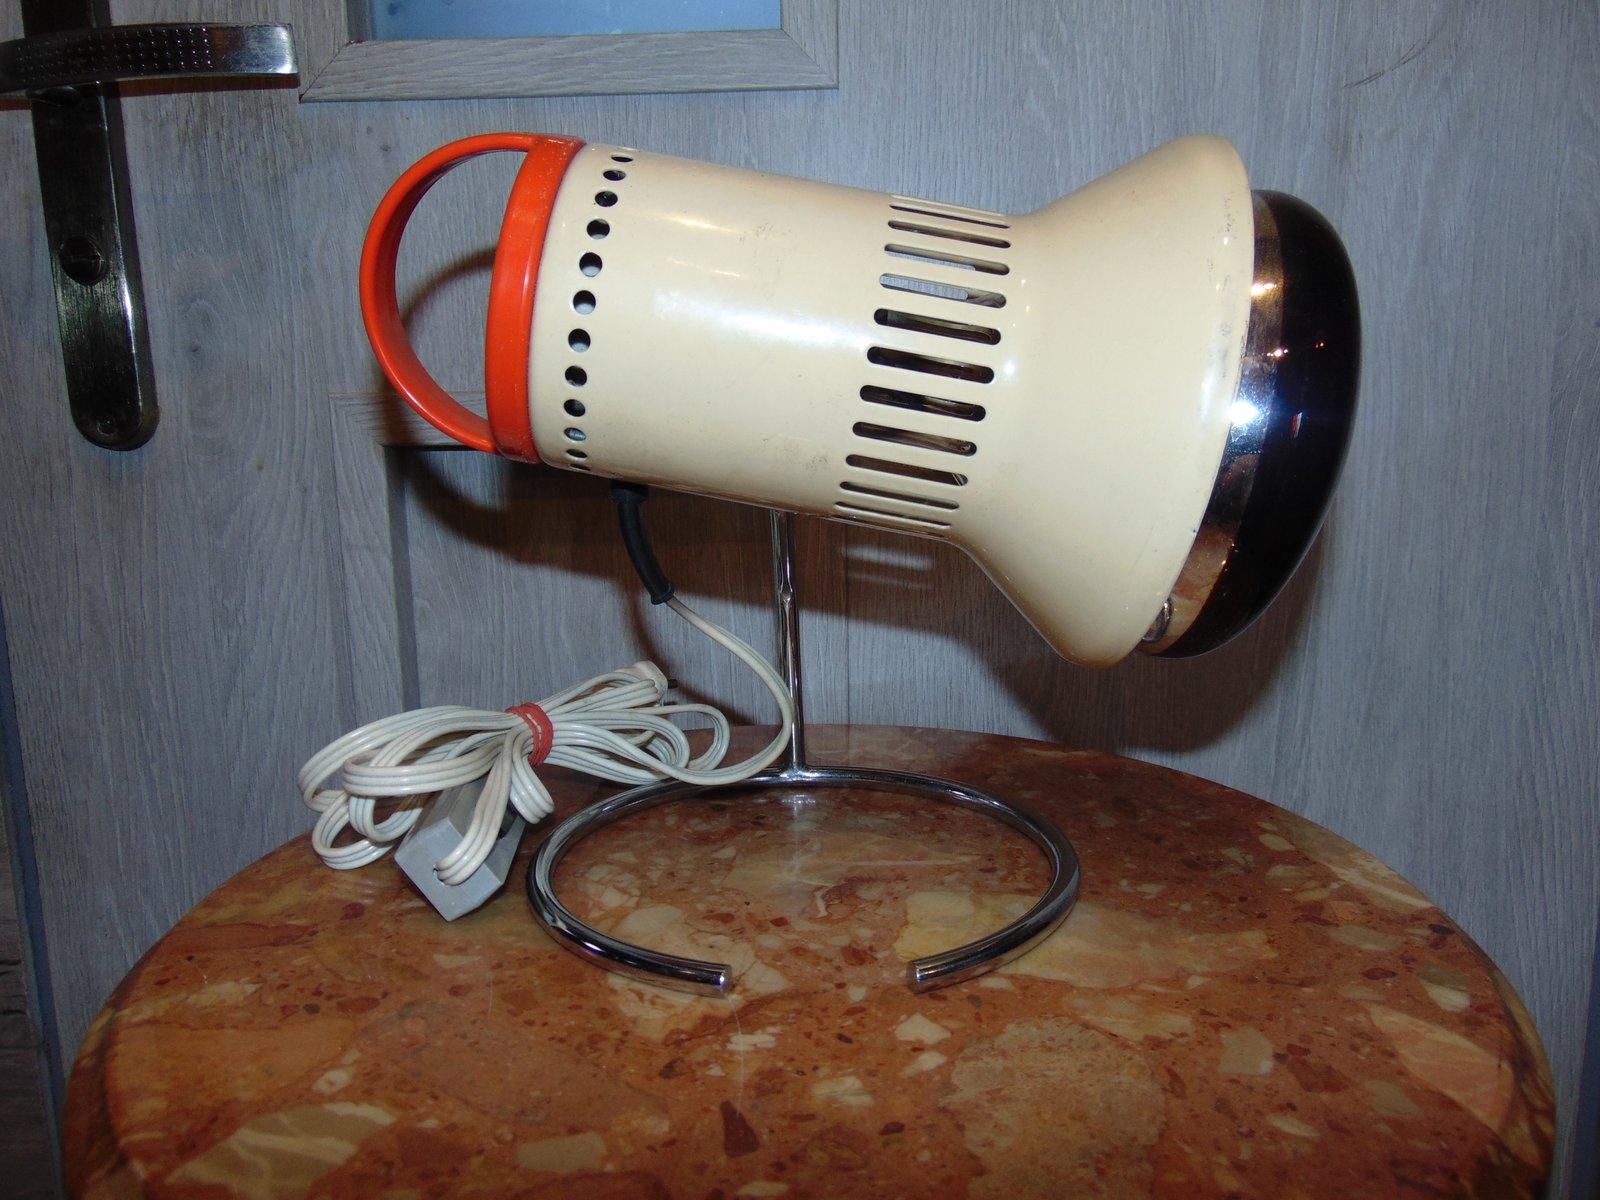 Industrielle Vintage Tischlampe, 1970er